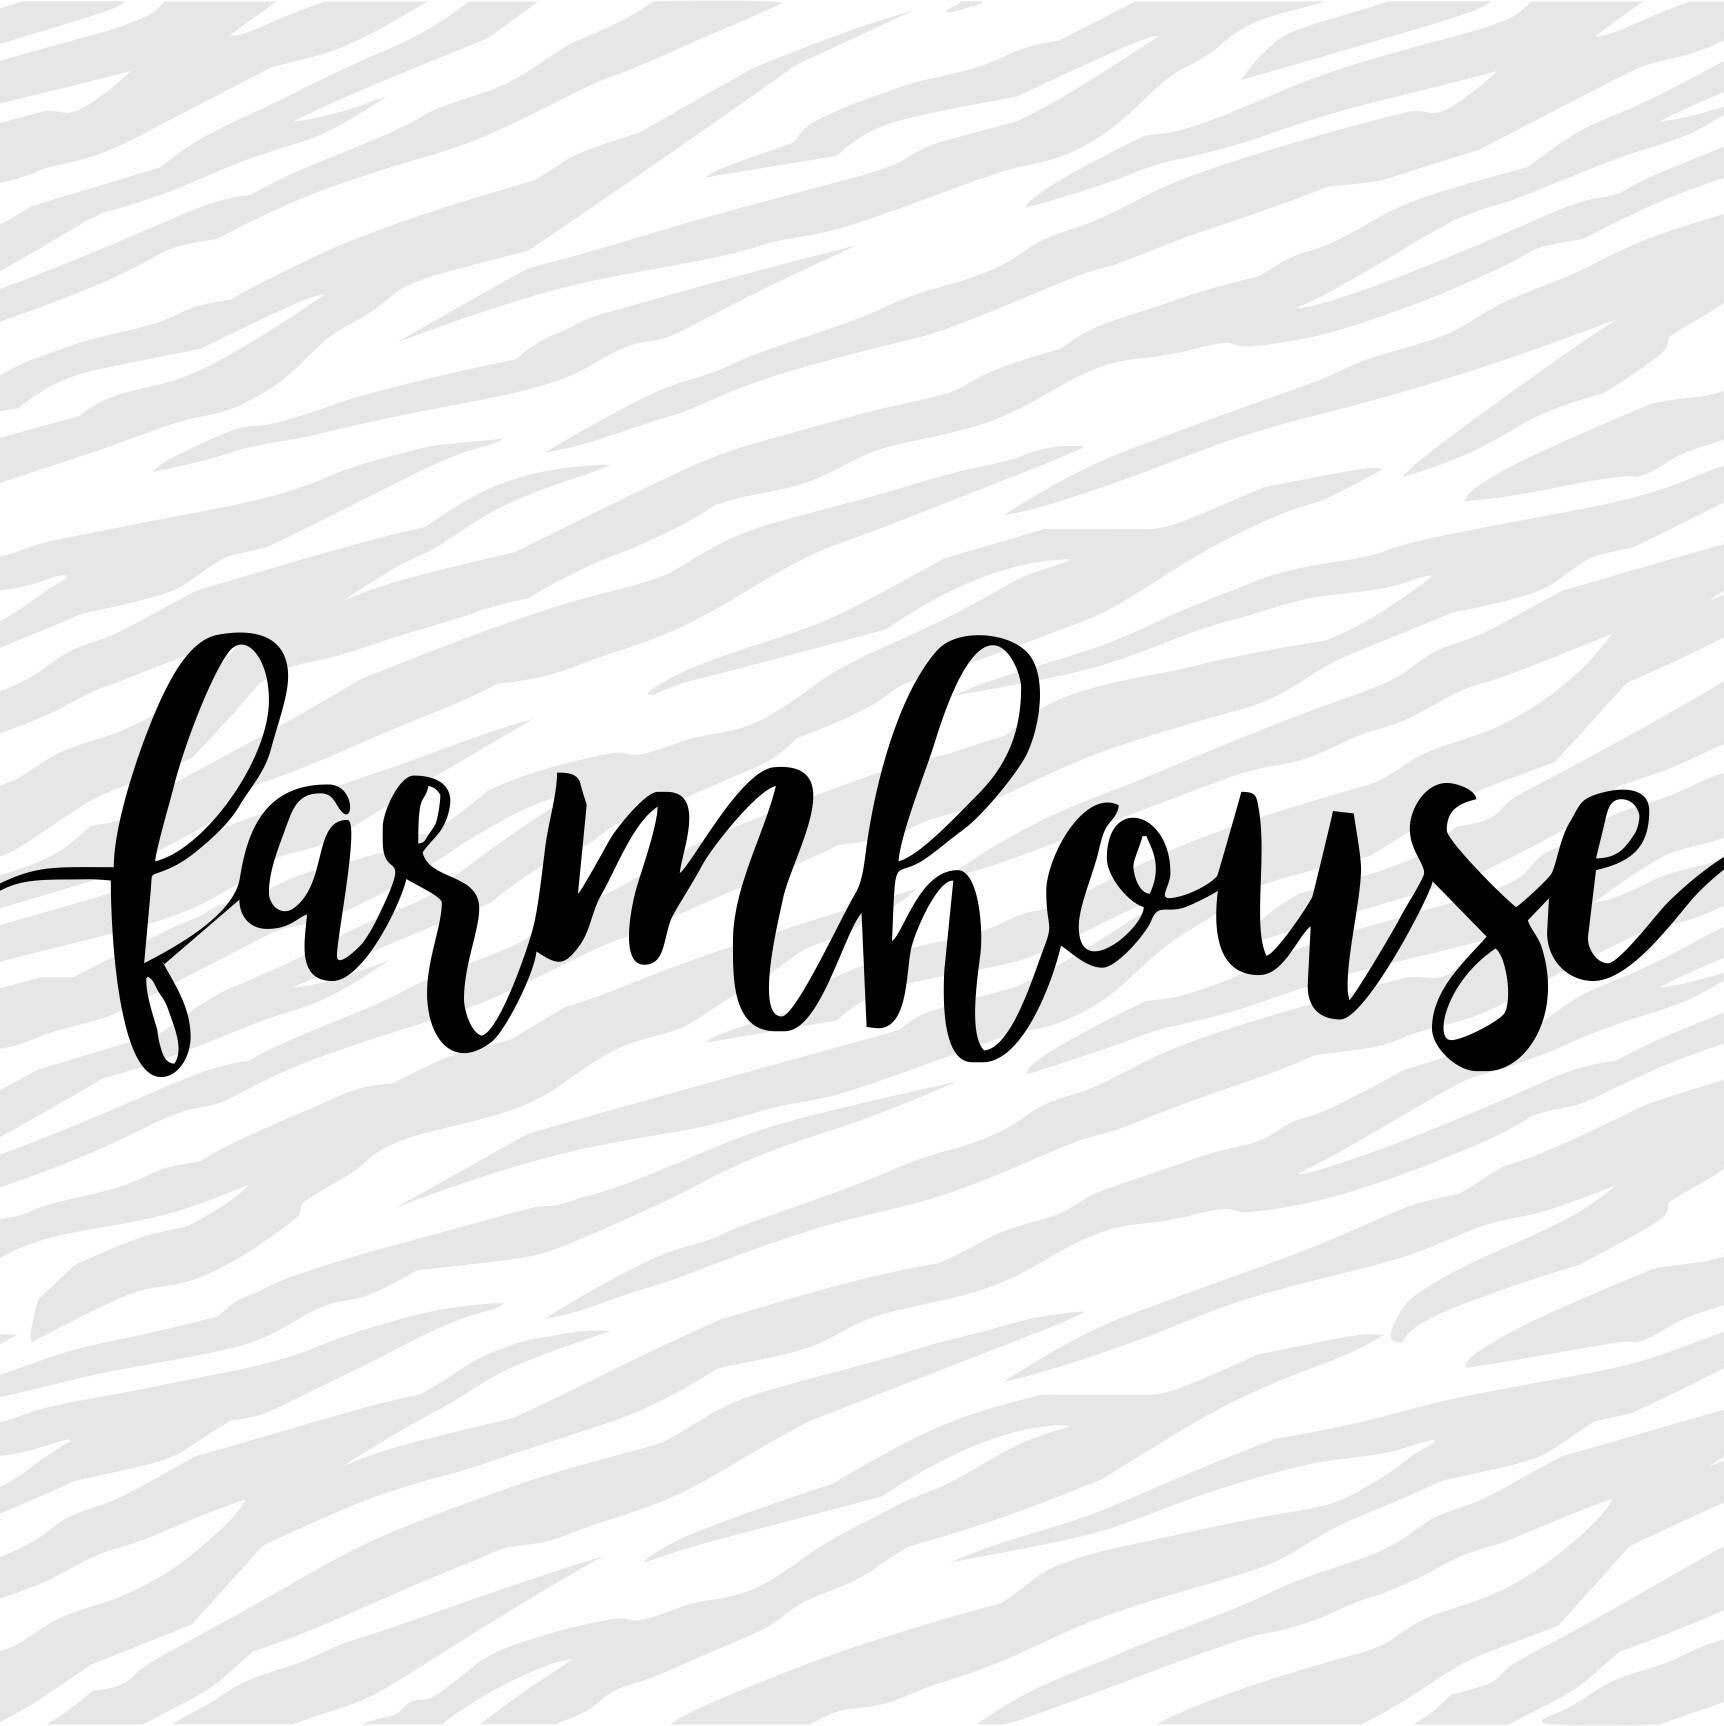 Farmhouse Script Vinyl Stencil for Wood Crafts